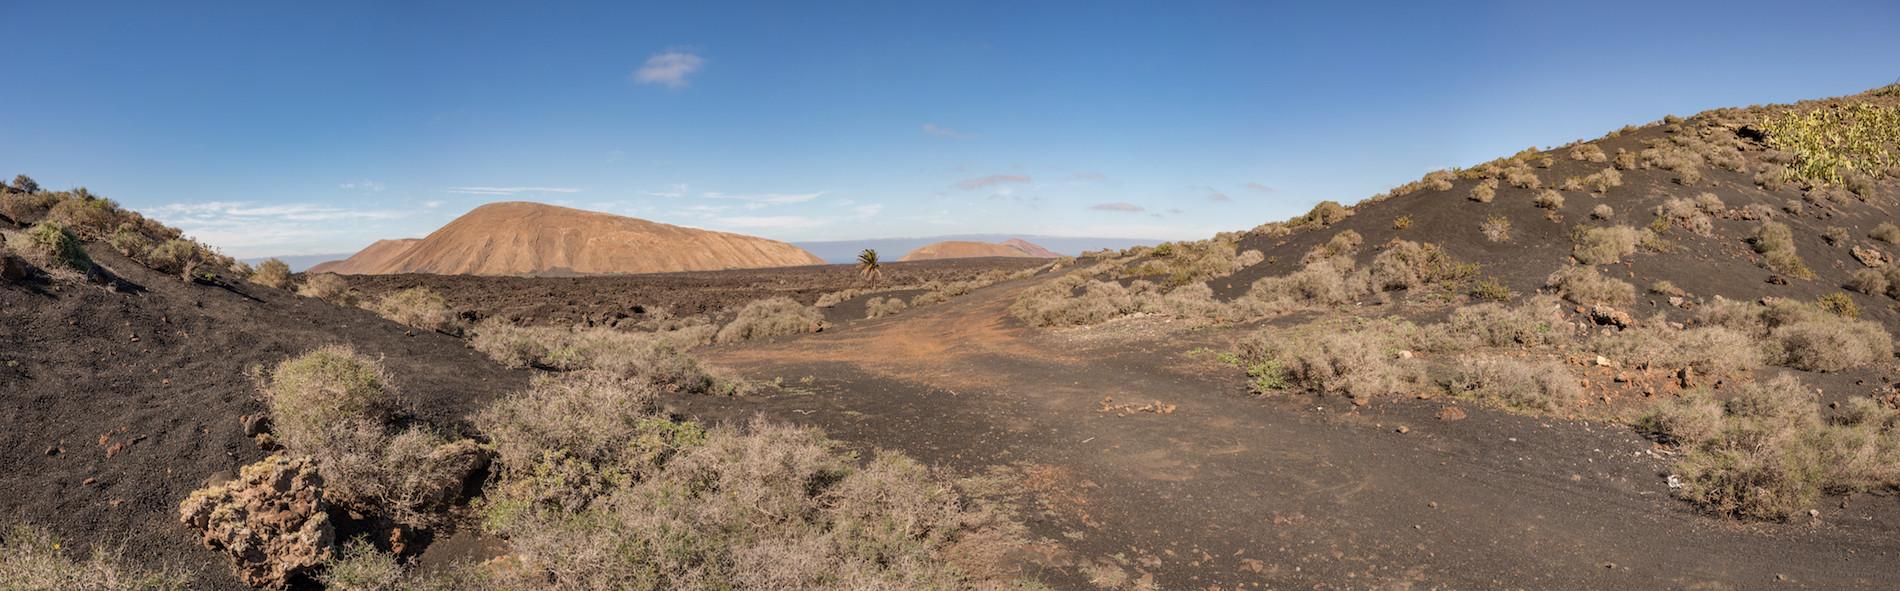 PHOTO Lanzarote Mancha Blanca panoramique